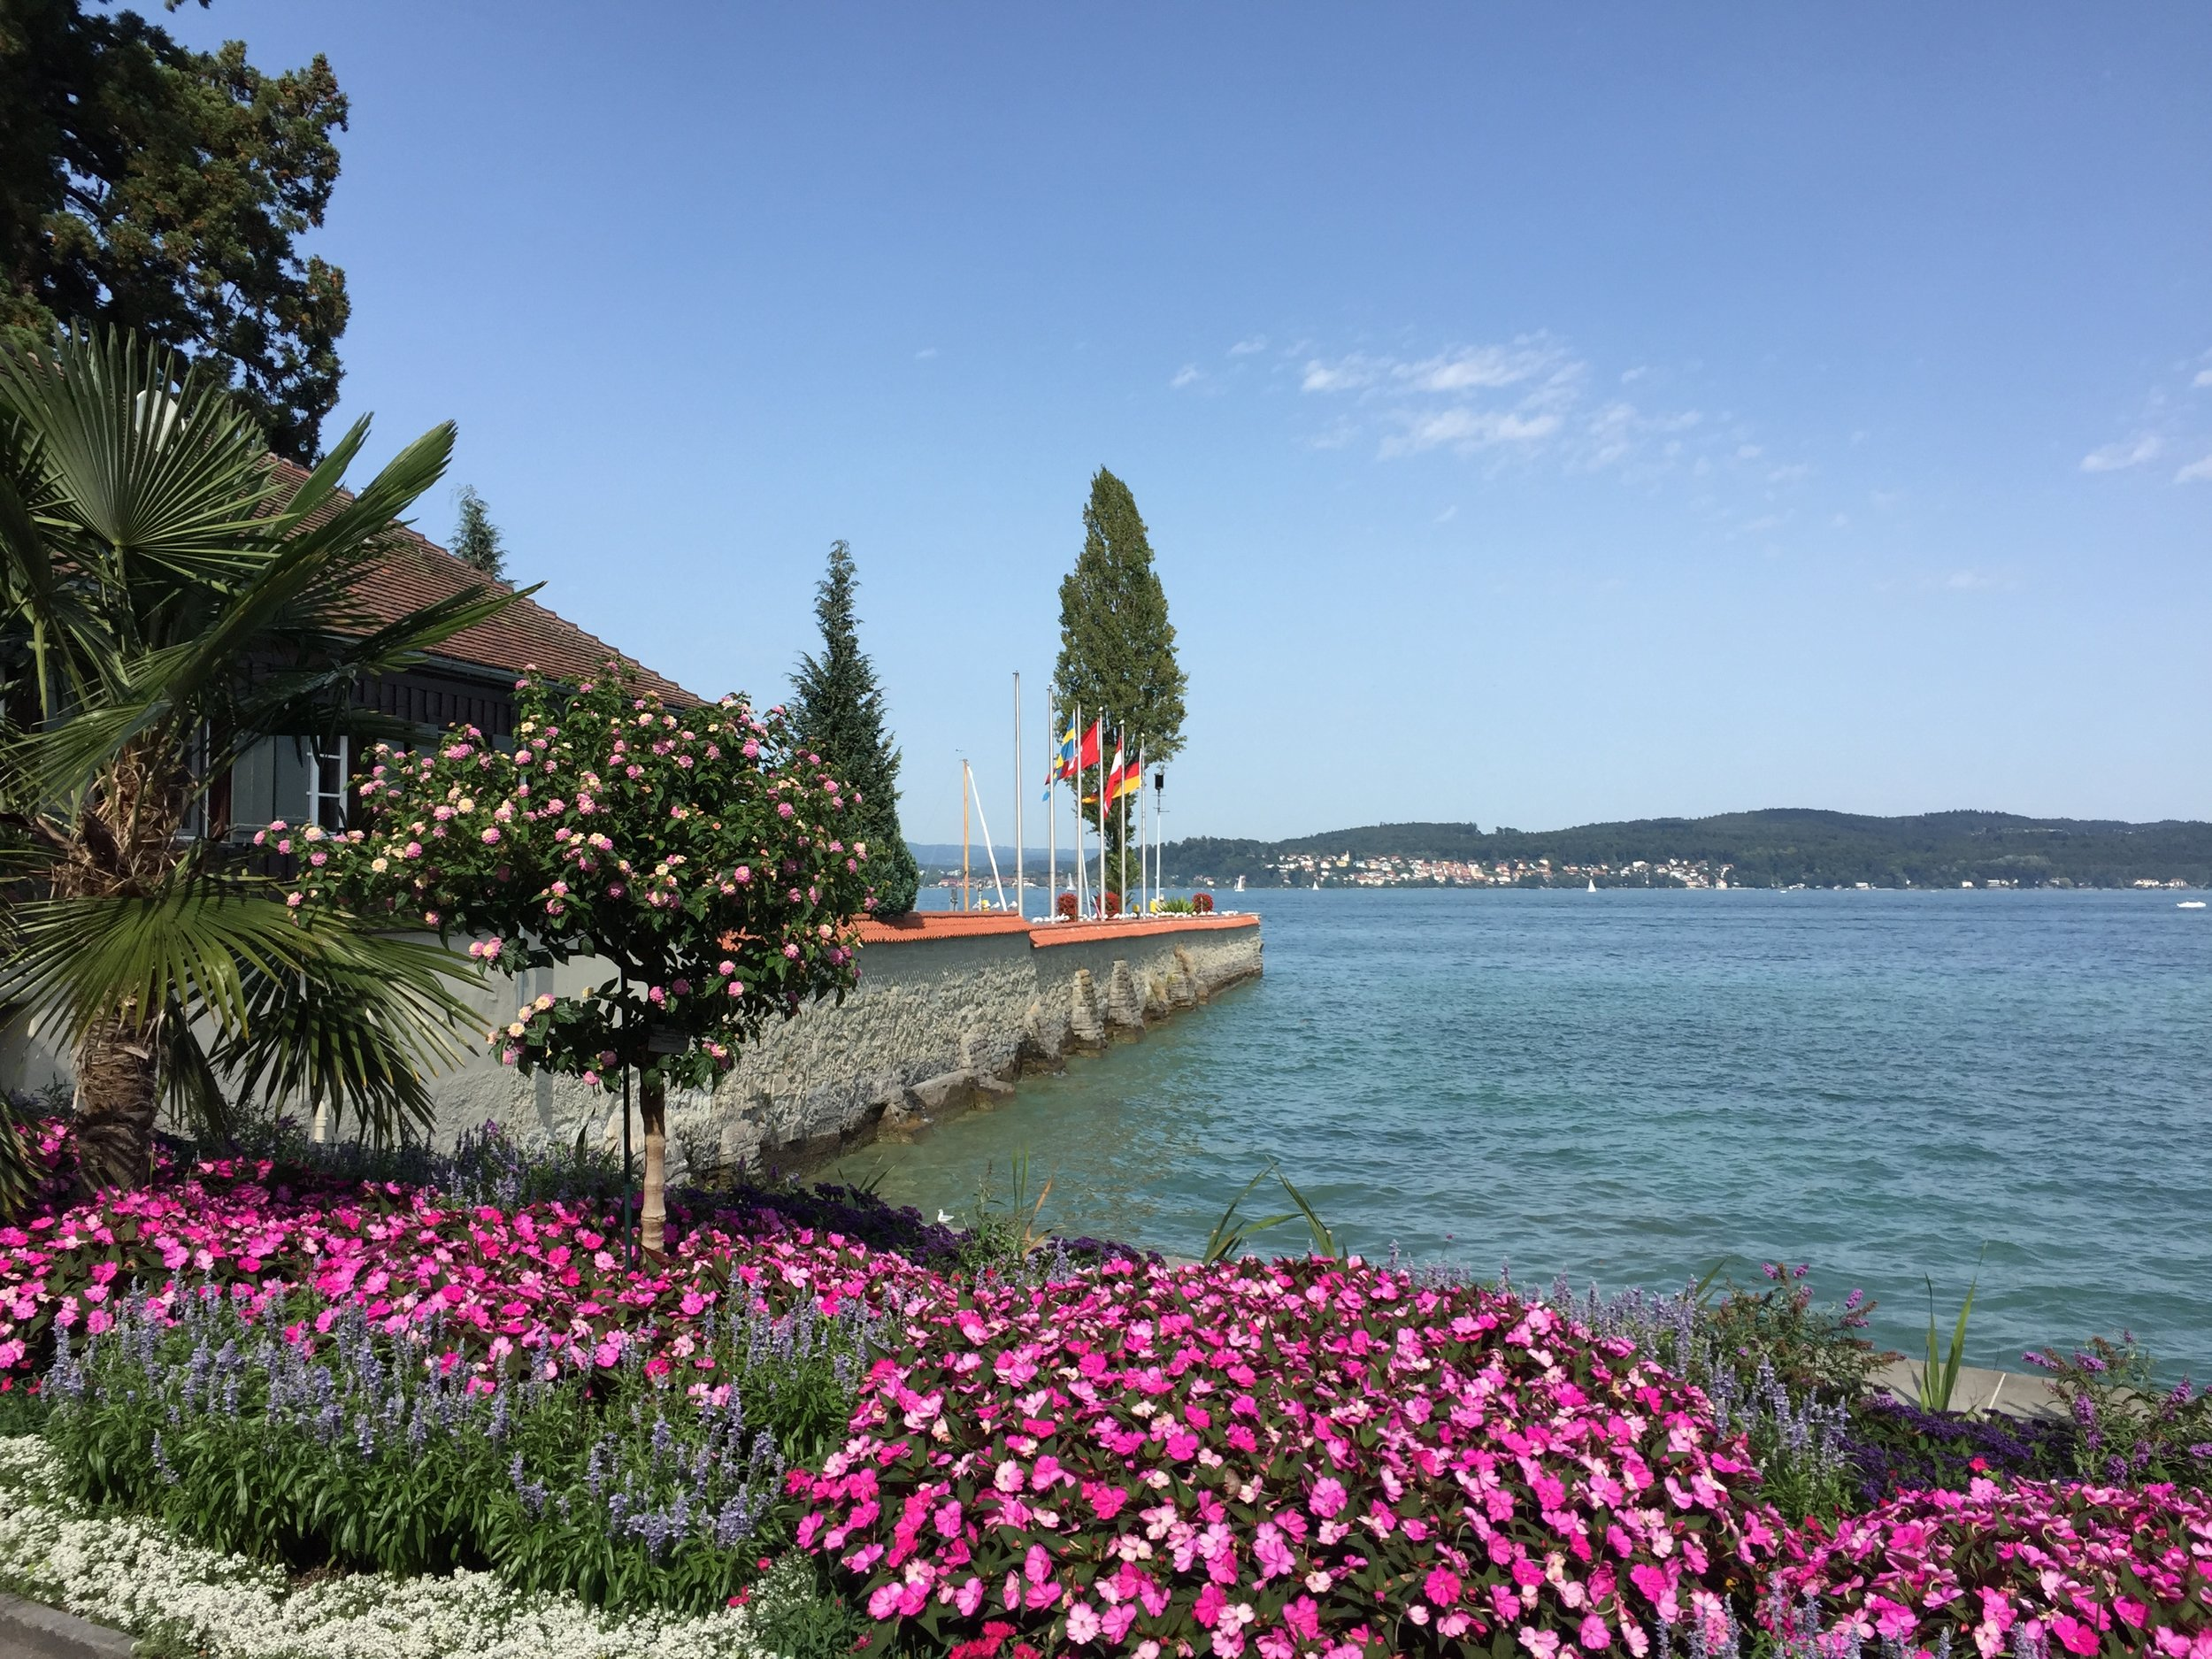 Mainau Island in Lake Constance